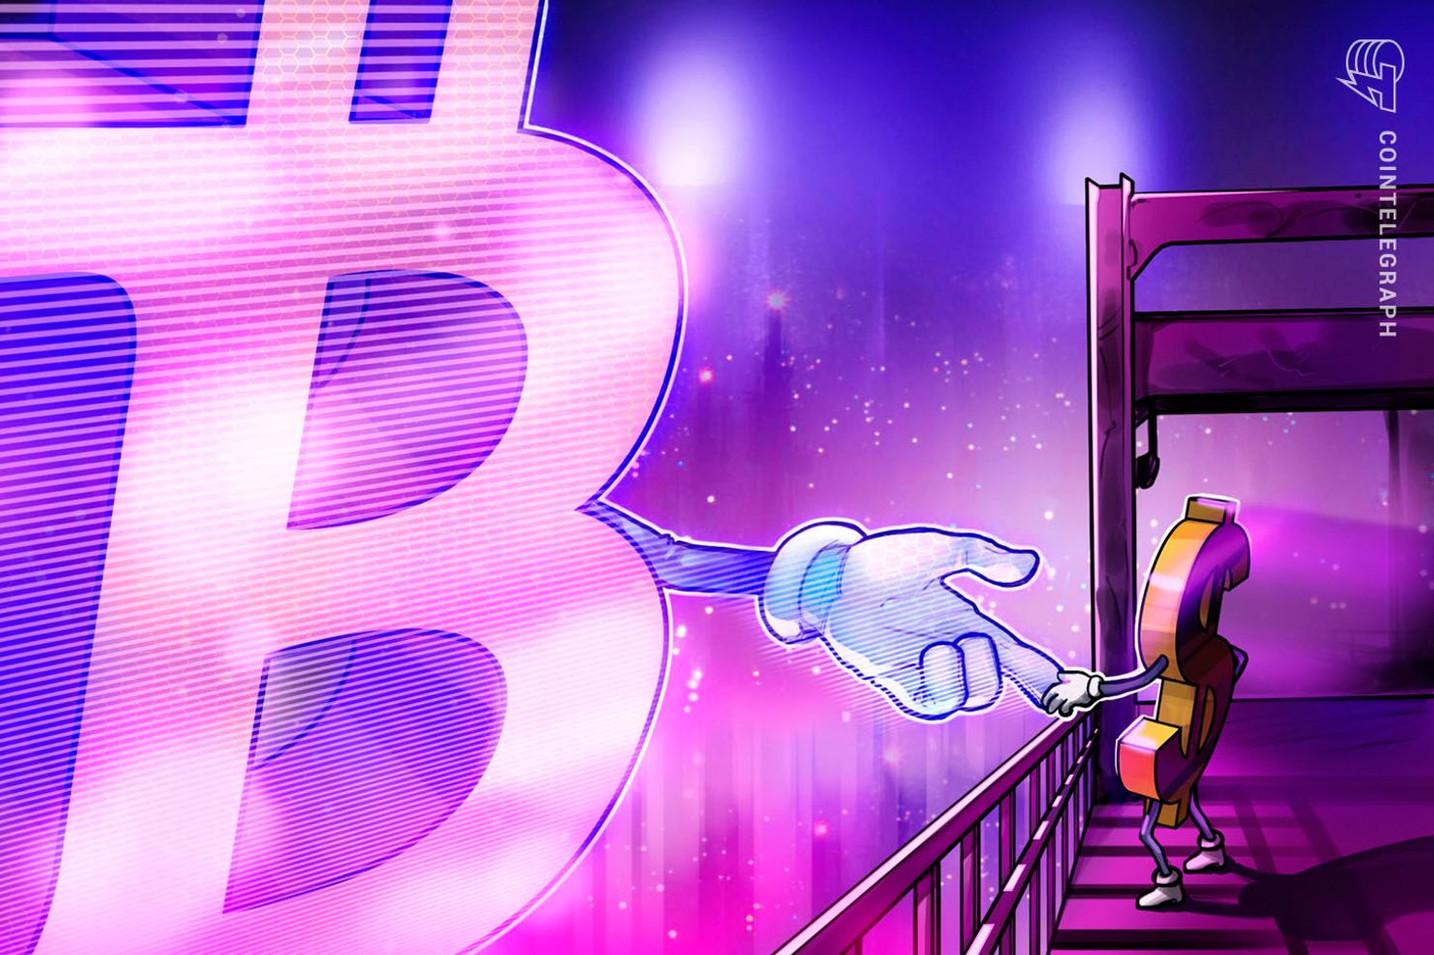 JPモルガンの株式上昇強気予想は「仮想通貨ビットコインに大量の資金流入につながる」